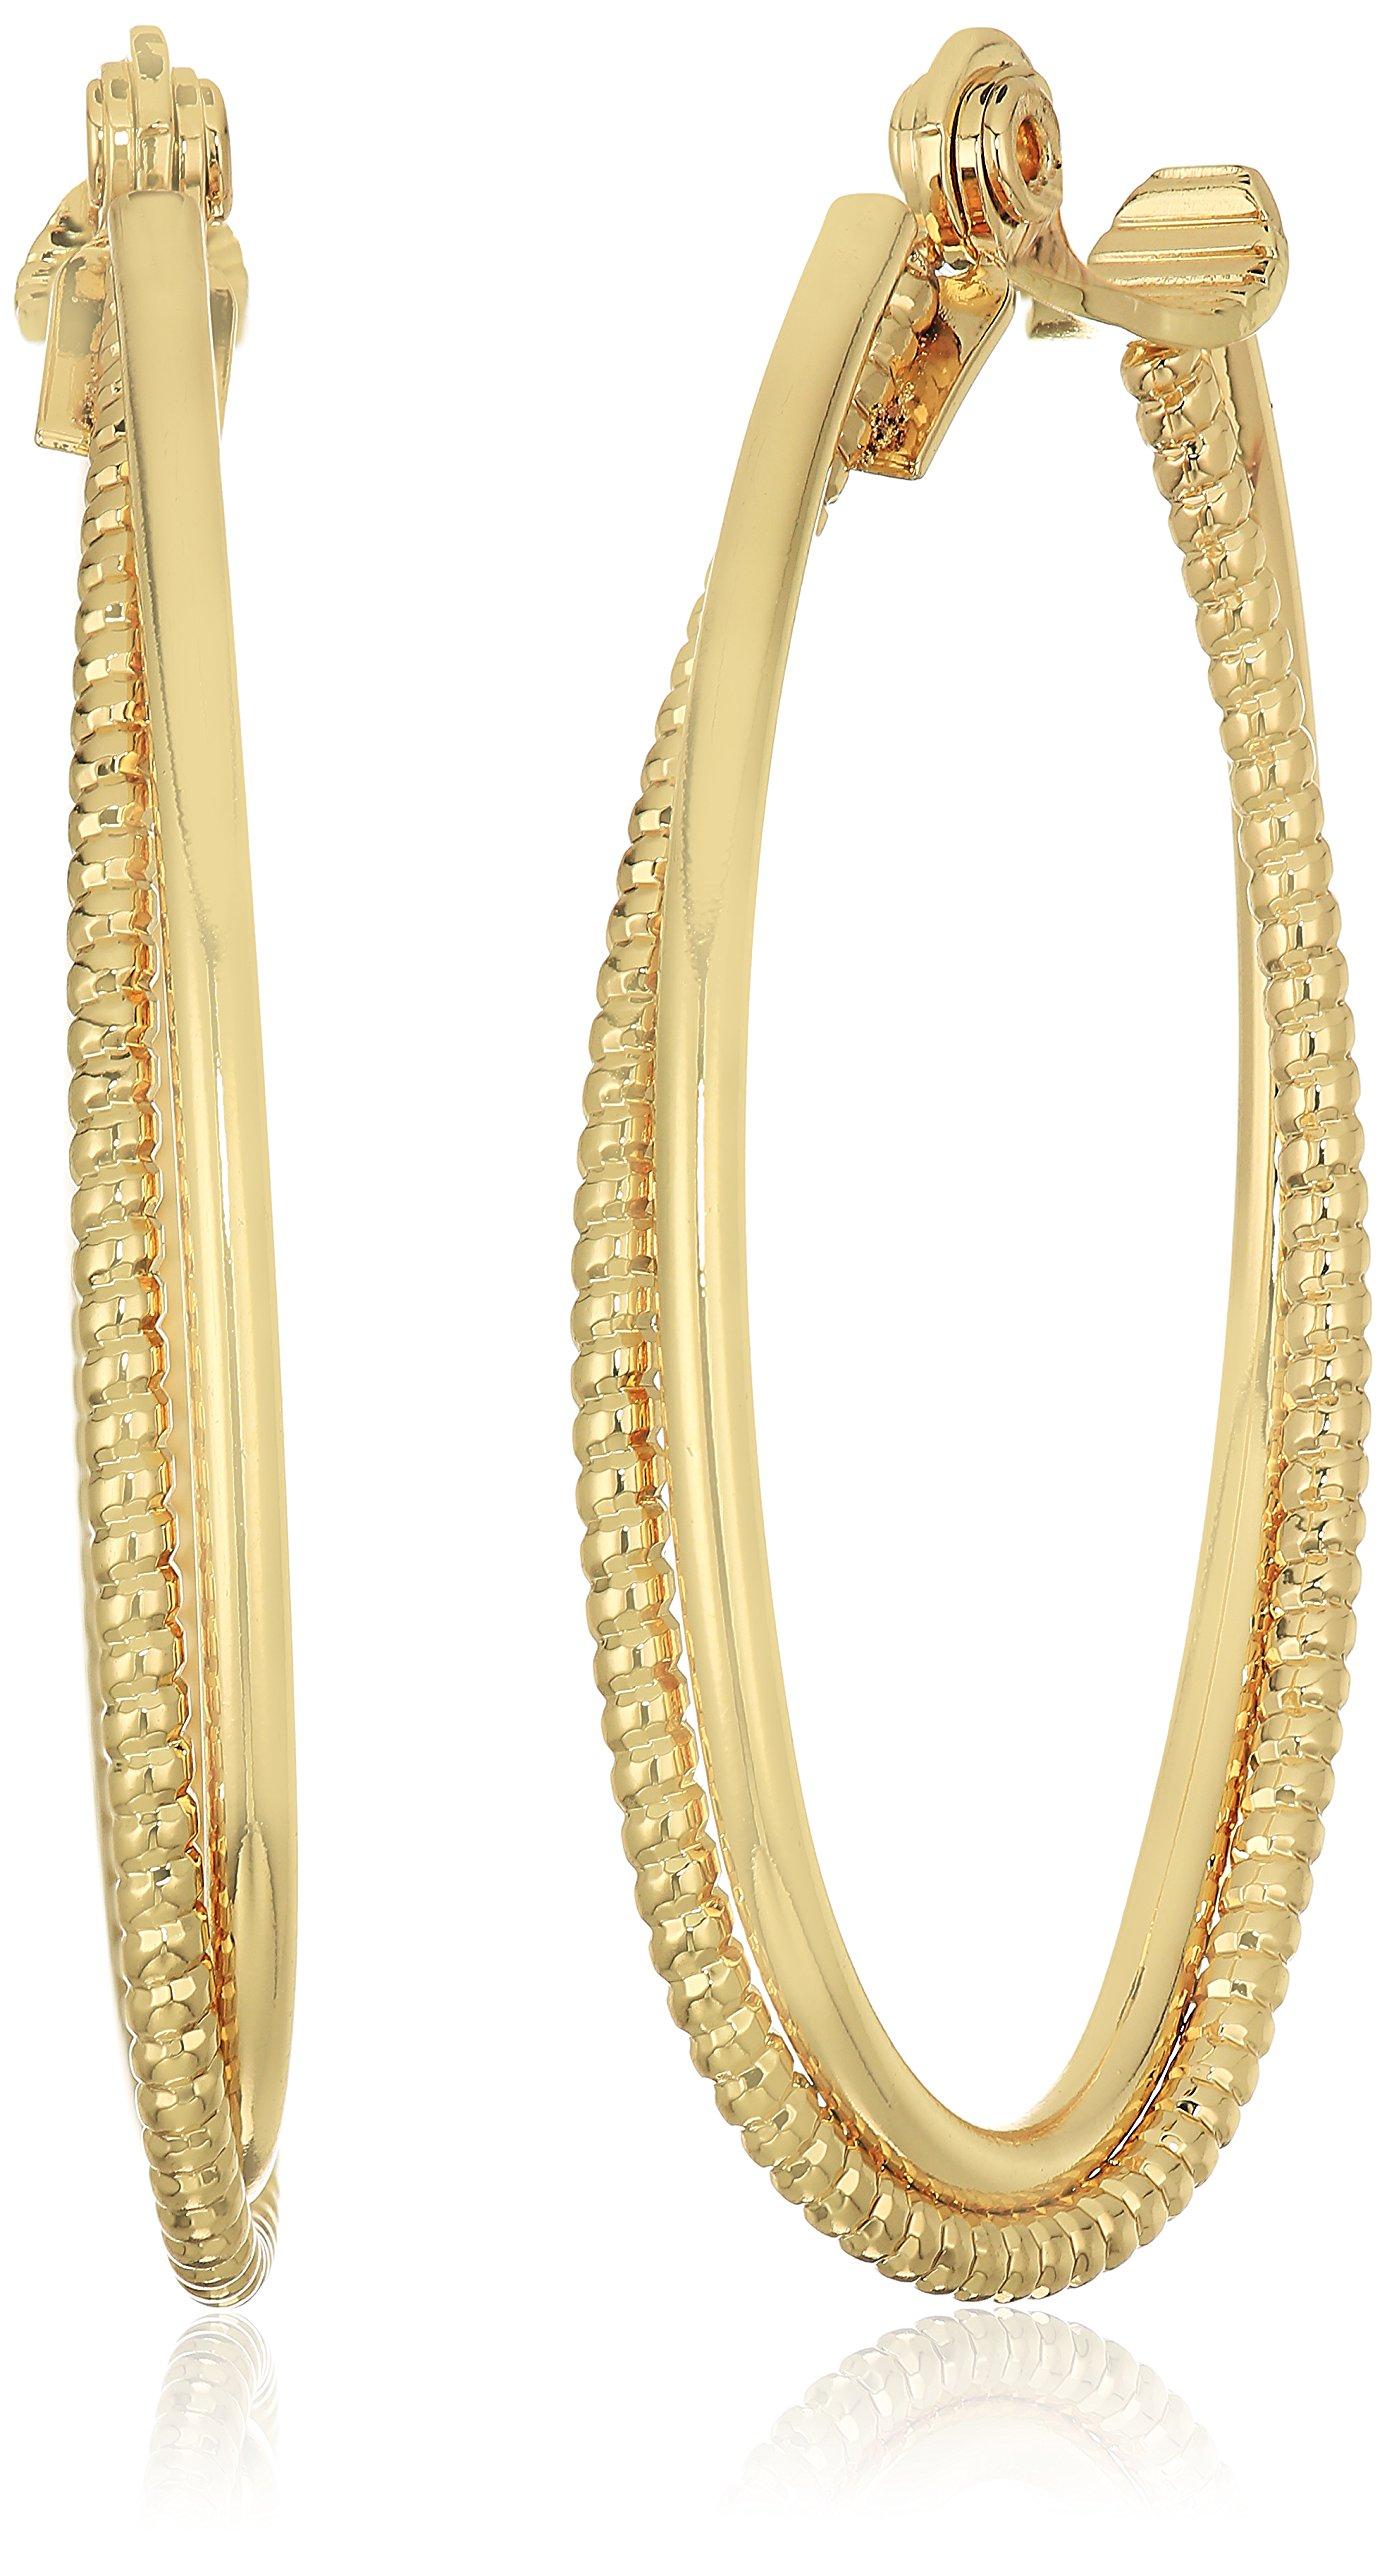 Anne Klein Women's Gold Tone Large Textured Hoop Clip On Earrings